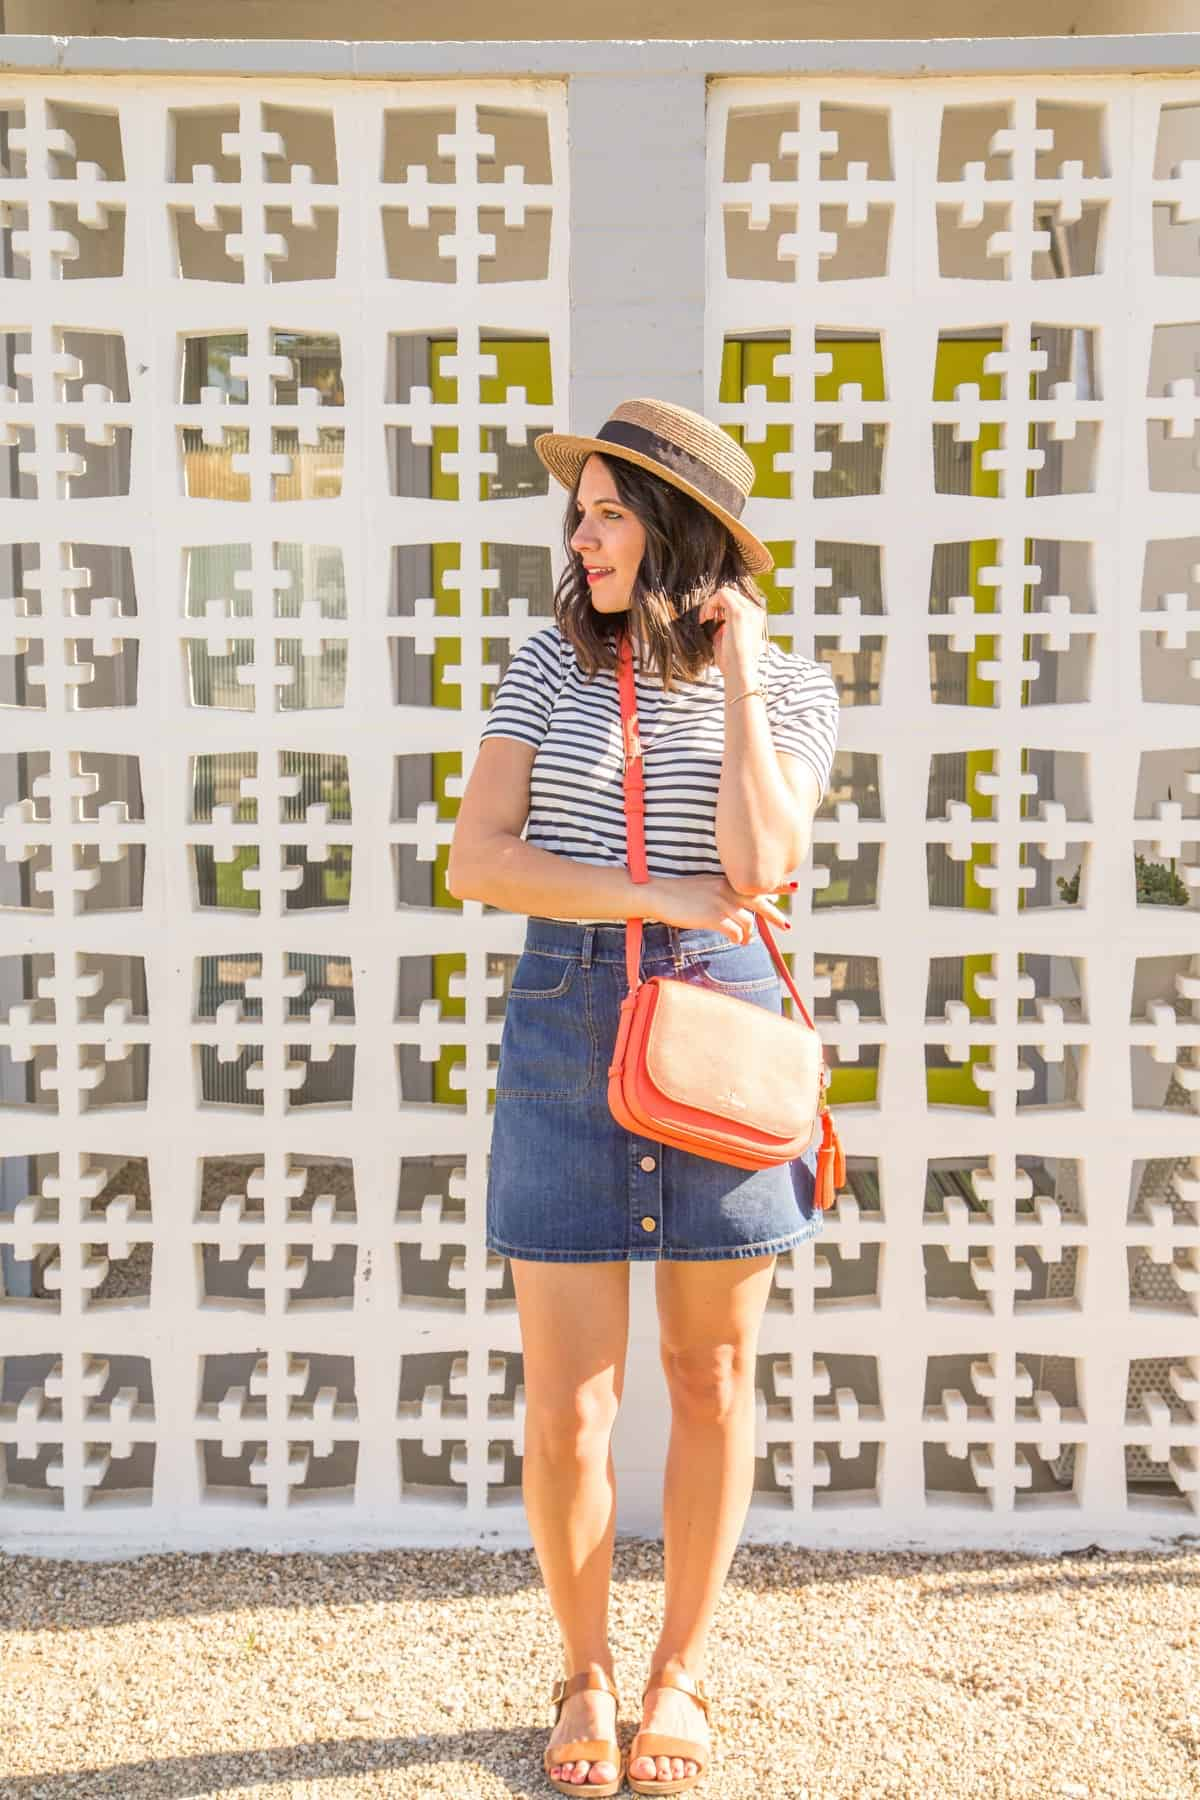 Coachella outfit ideas, summer outfit ideas - My Style Vita - @mystylevita